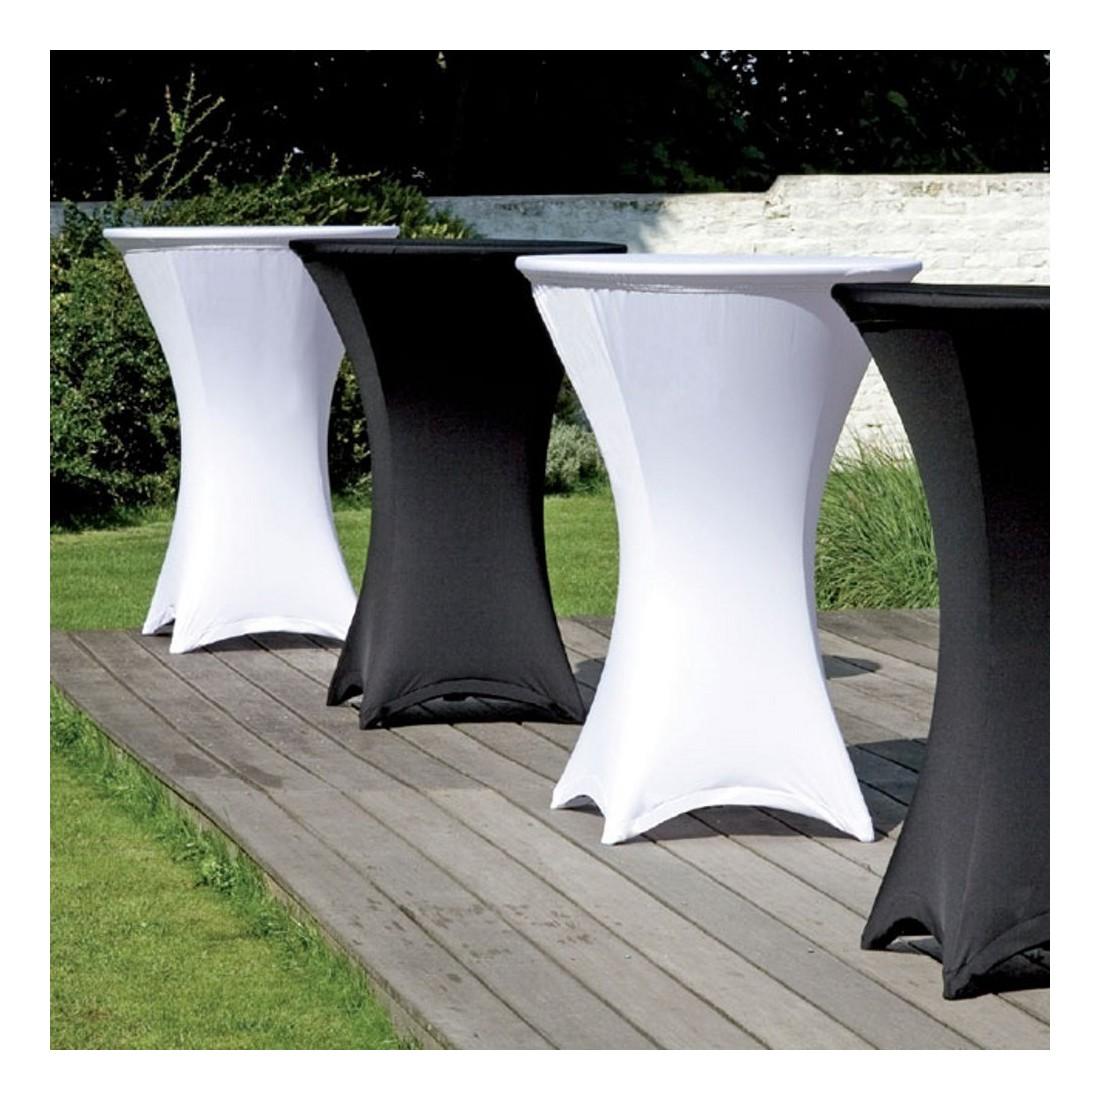 housse tubulaire en lycra blanc pour table mange debout. Black Bedroom Furniture Sets. Home Design Ideas